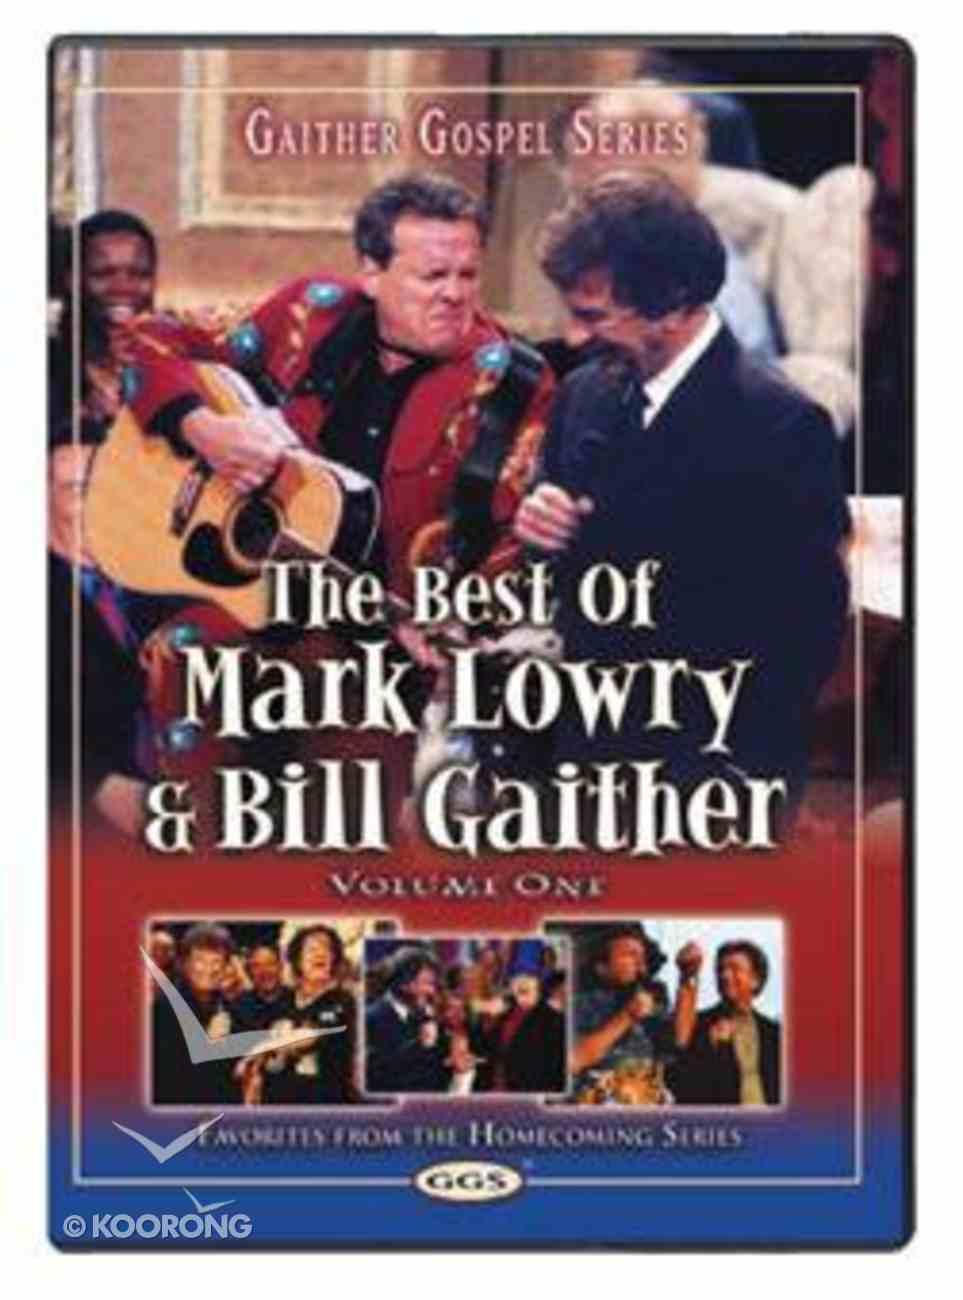 Best of Mark Lowry & Bill Gaither, the Volume 1 (Gaither Gospel Series) DVD